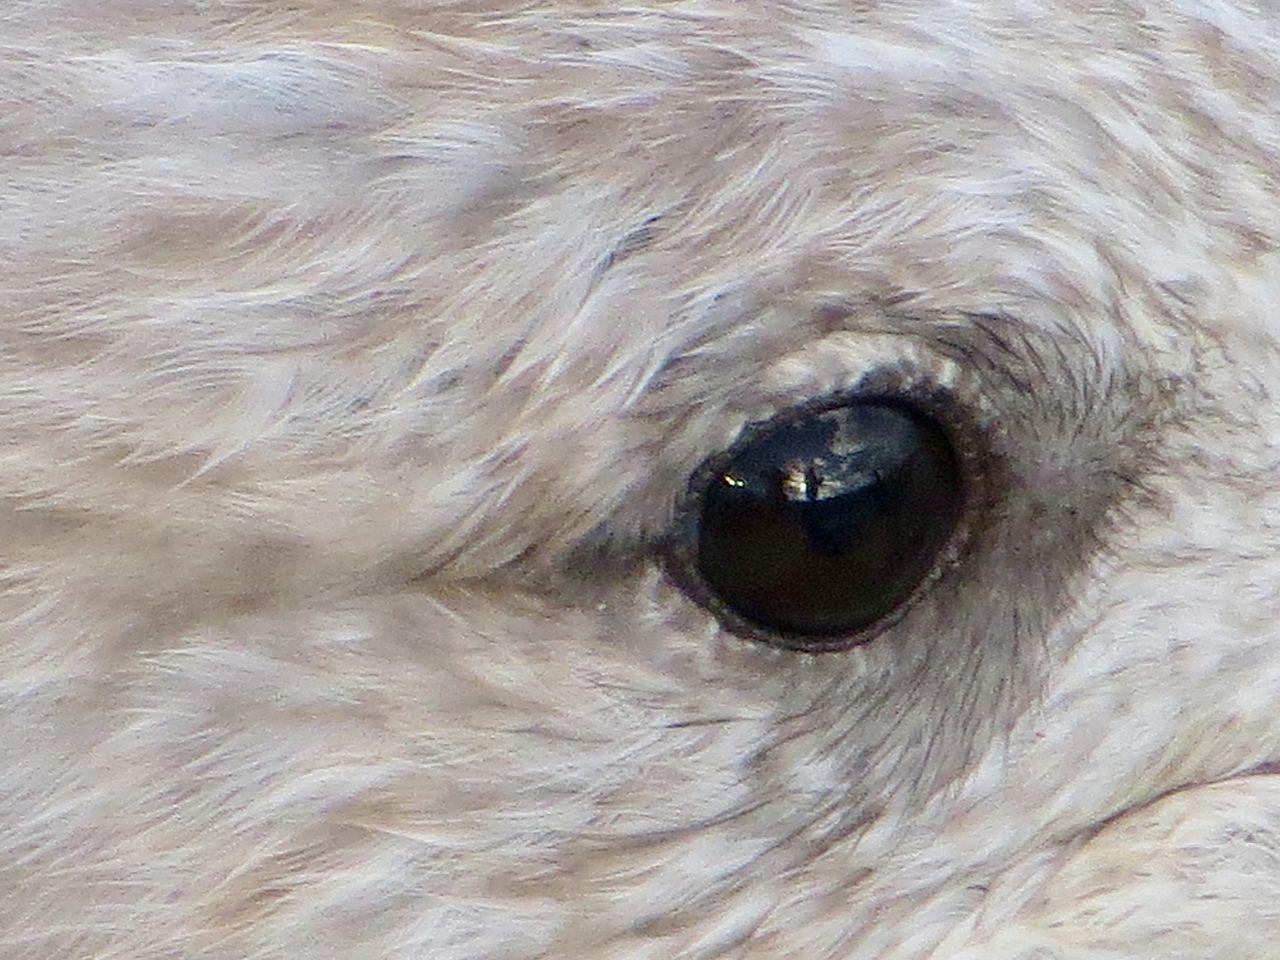 Bird Bird Eye Close-up Day Eyeball Gull Nature No People Outdoors Reflection In Eye